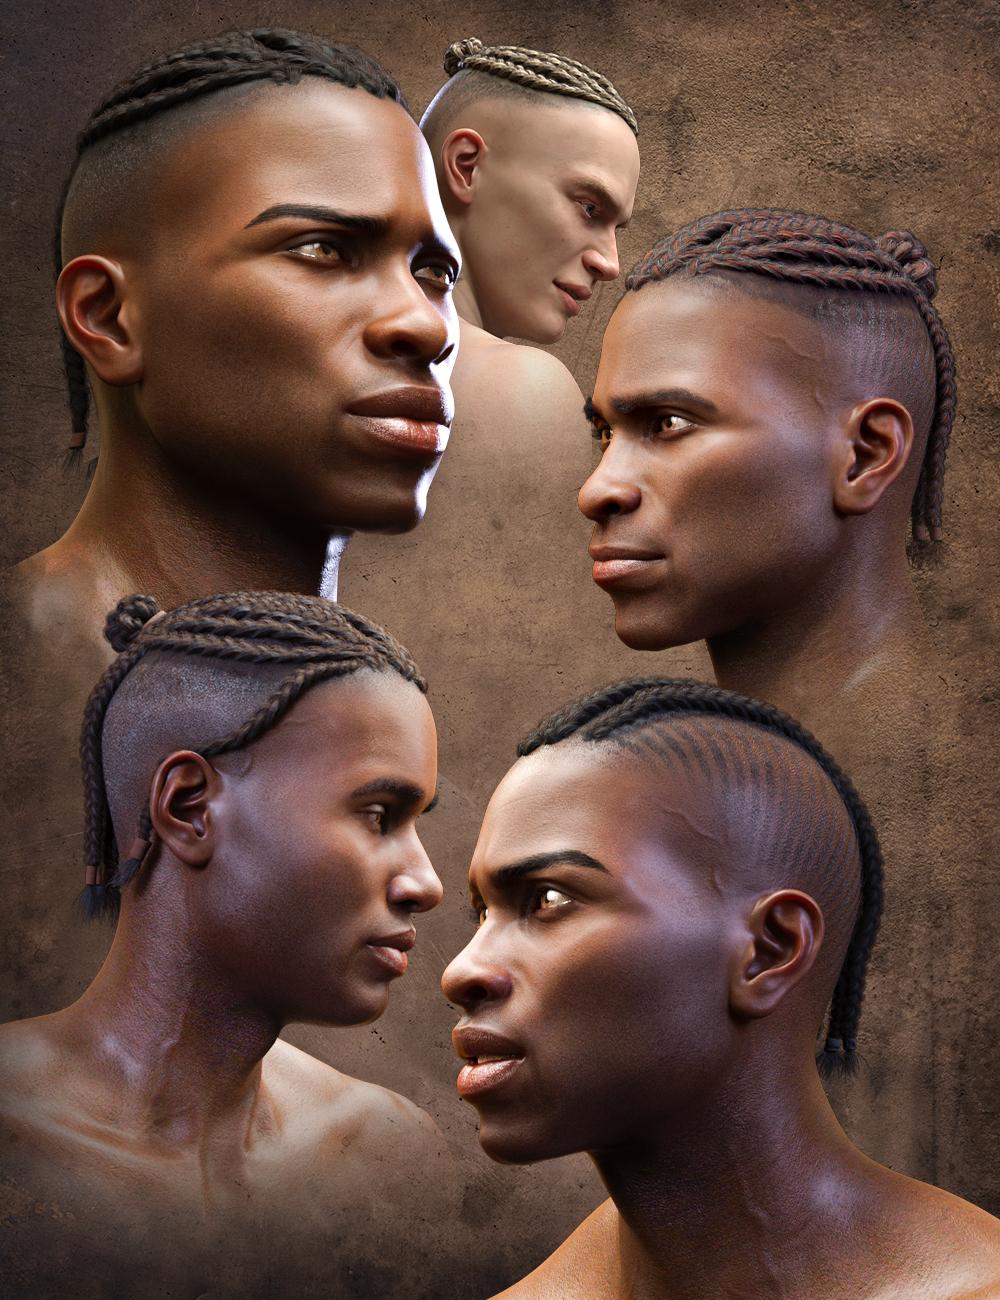 Corn Row Hair Set for Genesis 8.1 and Genesis 8 Males by: Matari3D, 3D Models by Daz 3D